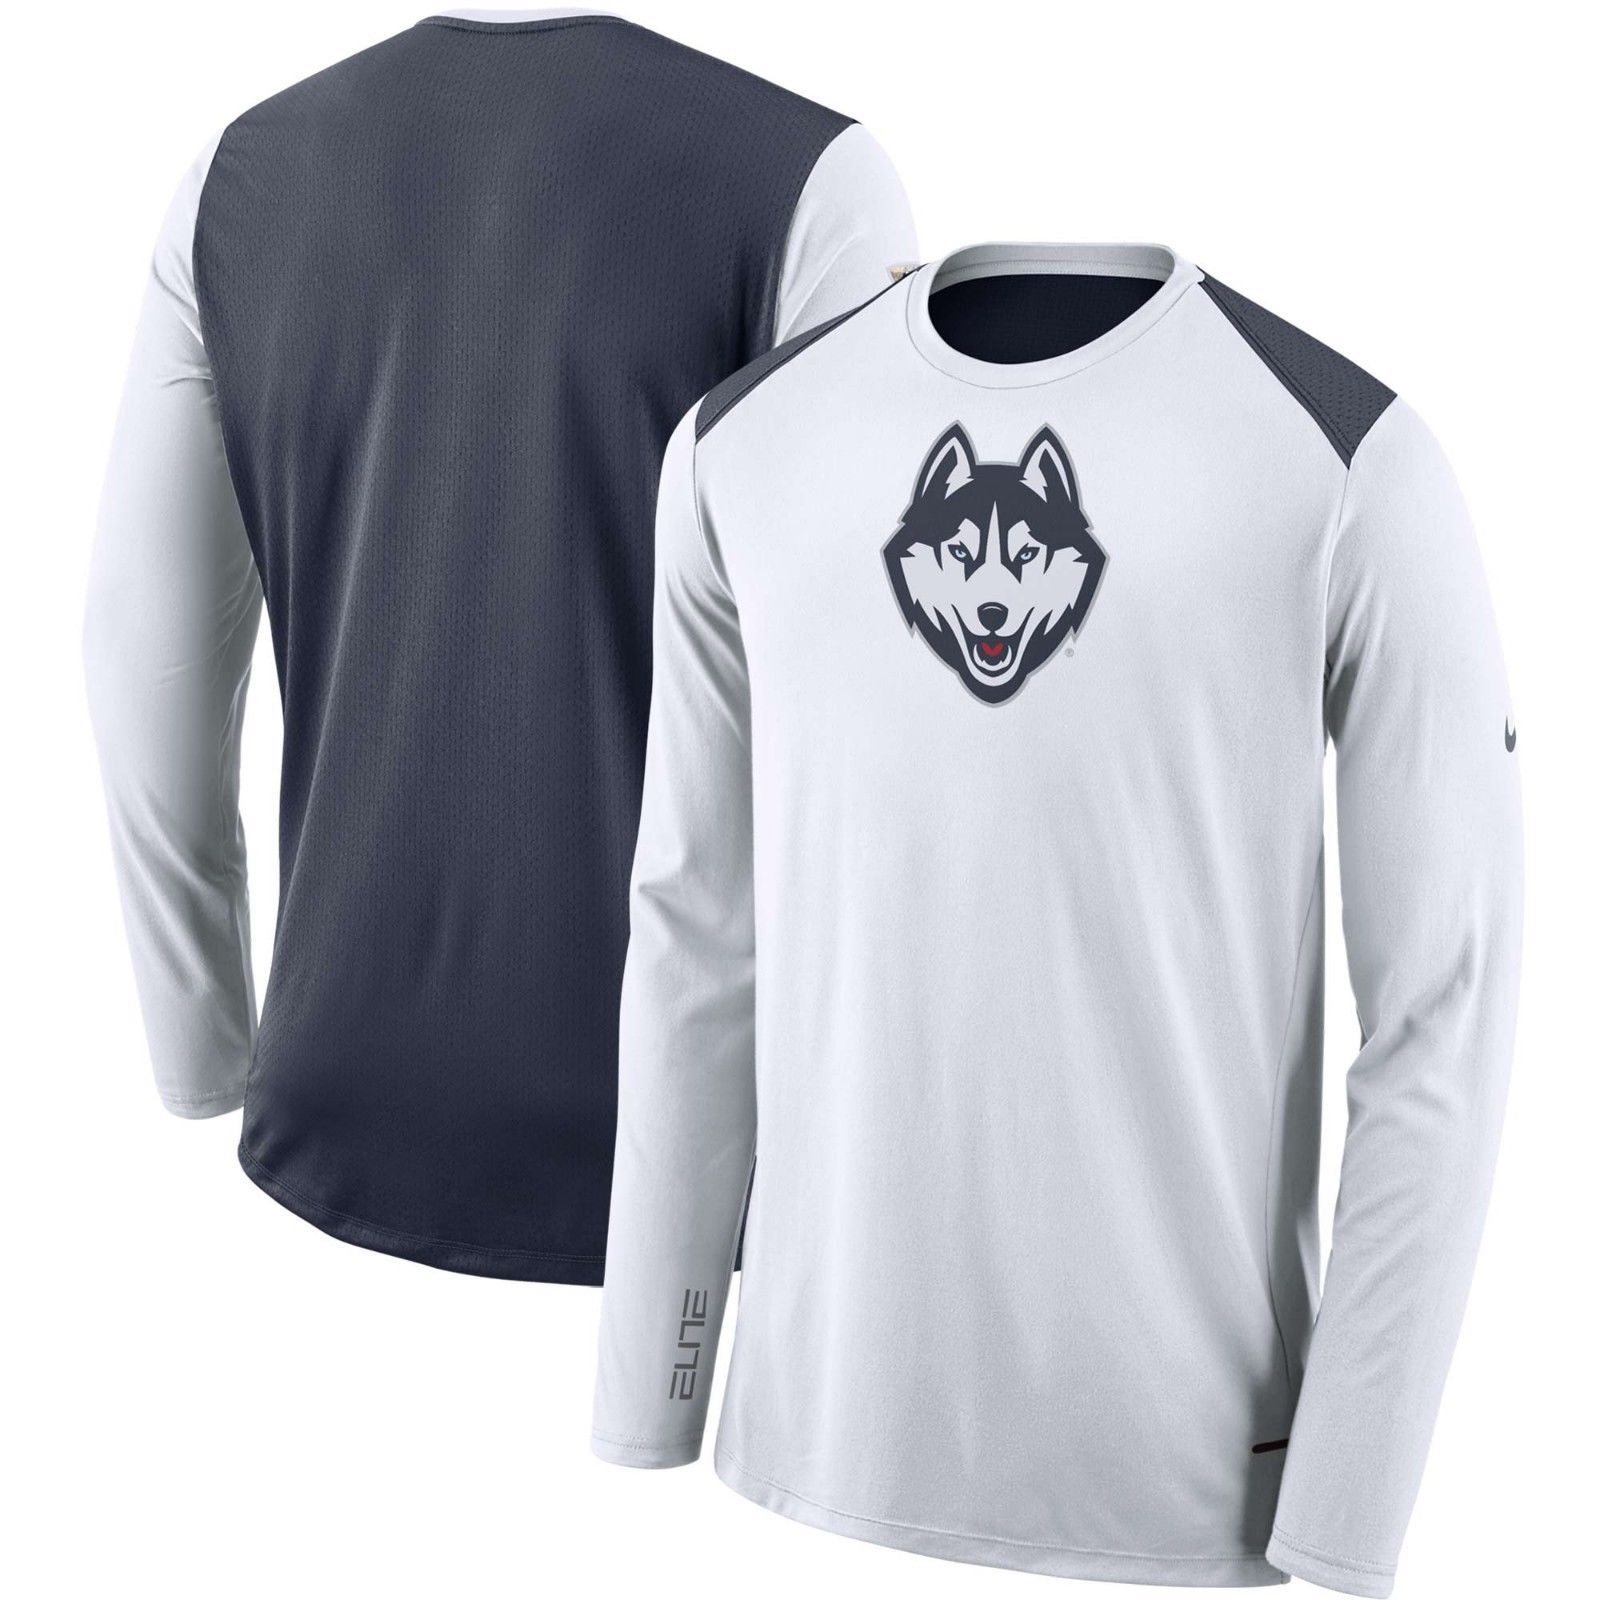 abd8dfade4 UConn Huskies Nike Men s DRI-FIT Elite Shooter L S T-Shirt - Size Large -  NWT